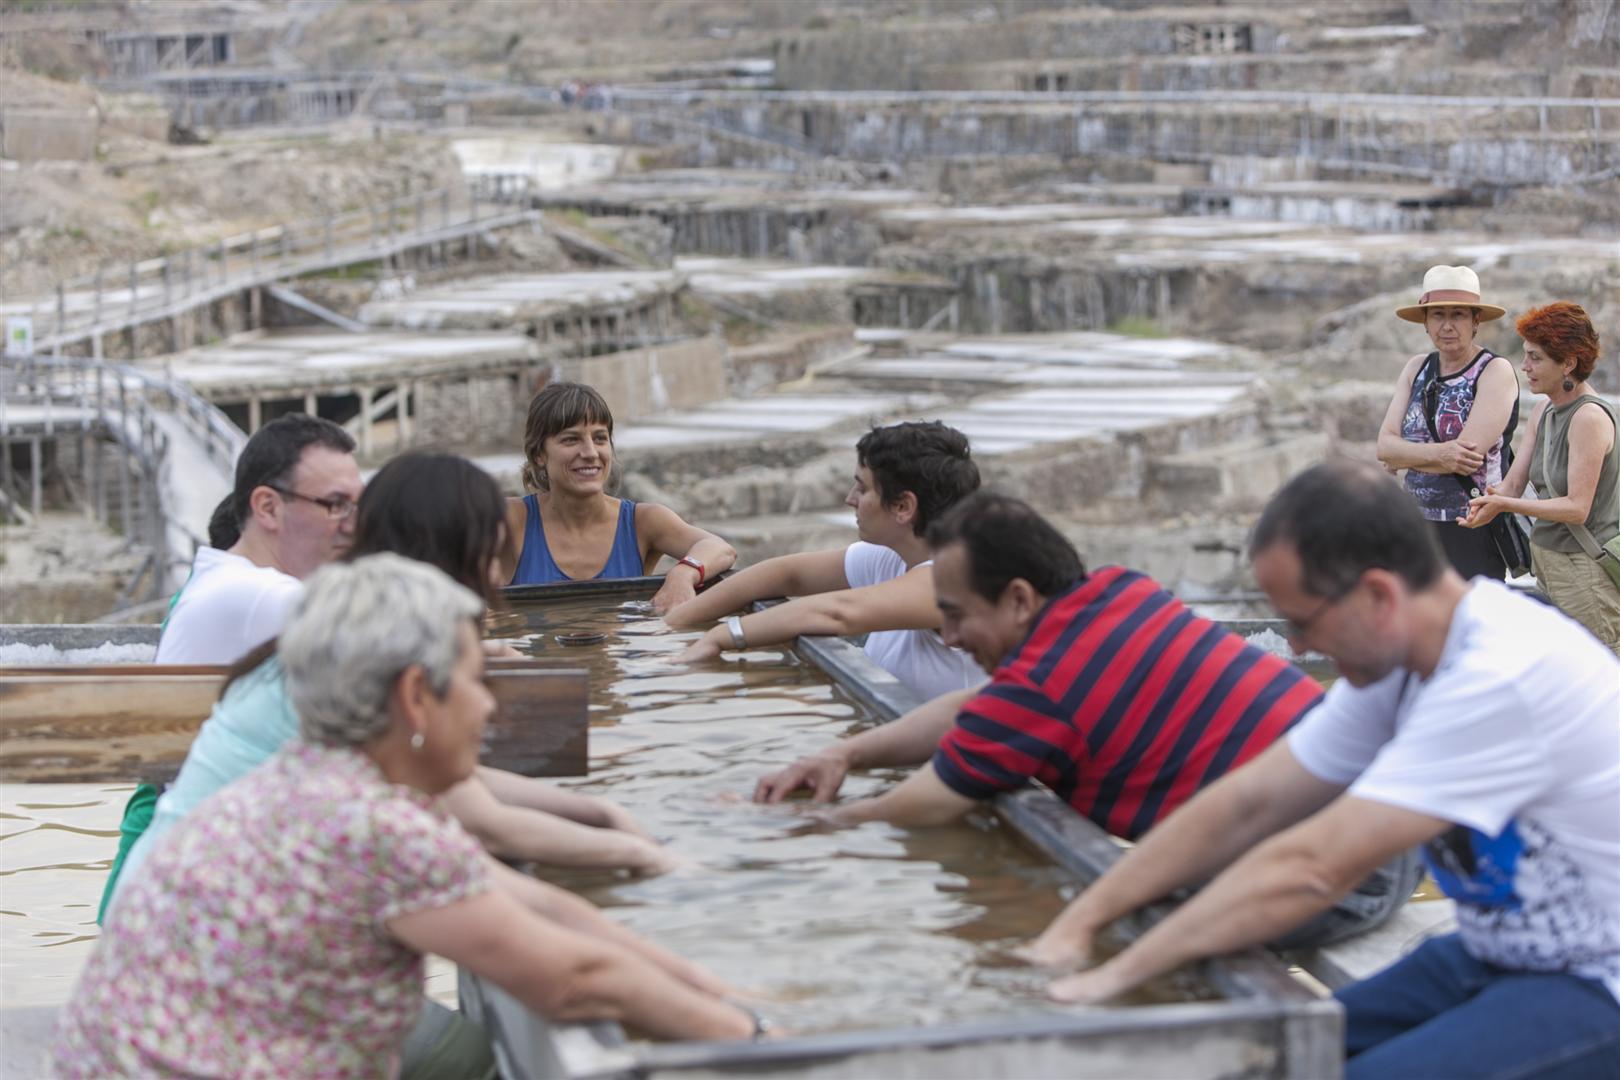 Spa salino for Pediluvio piscina